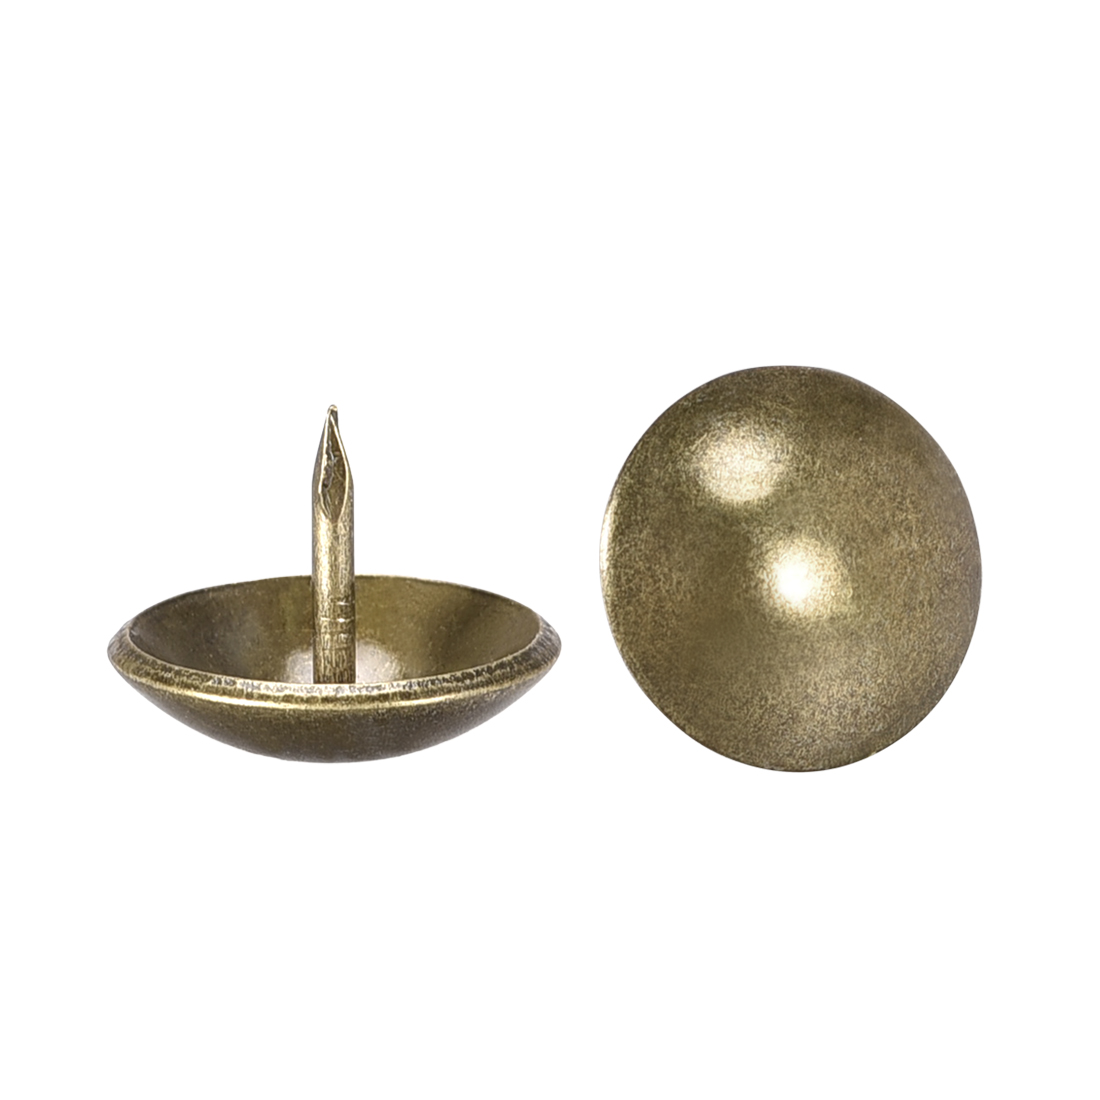 Upholstery Nails Tacks 19mm Dia 15mm Height Round Push Pins Bronze Tone 50 Pcs